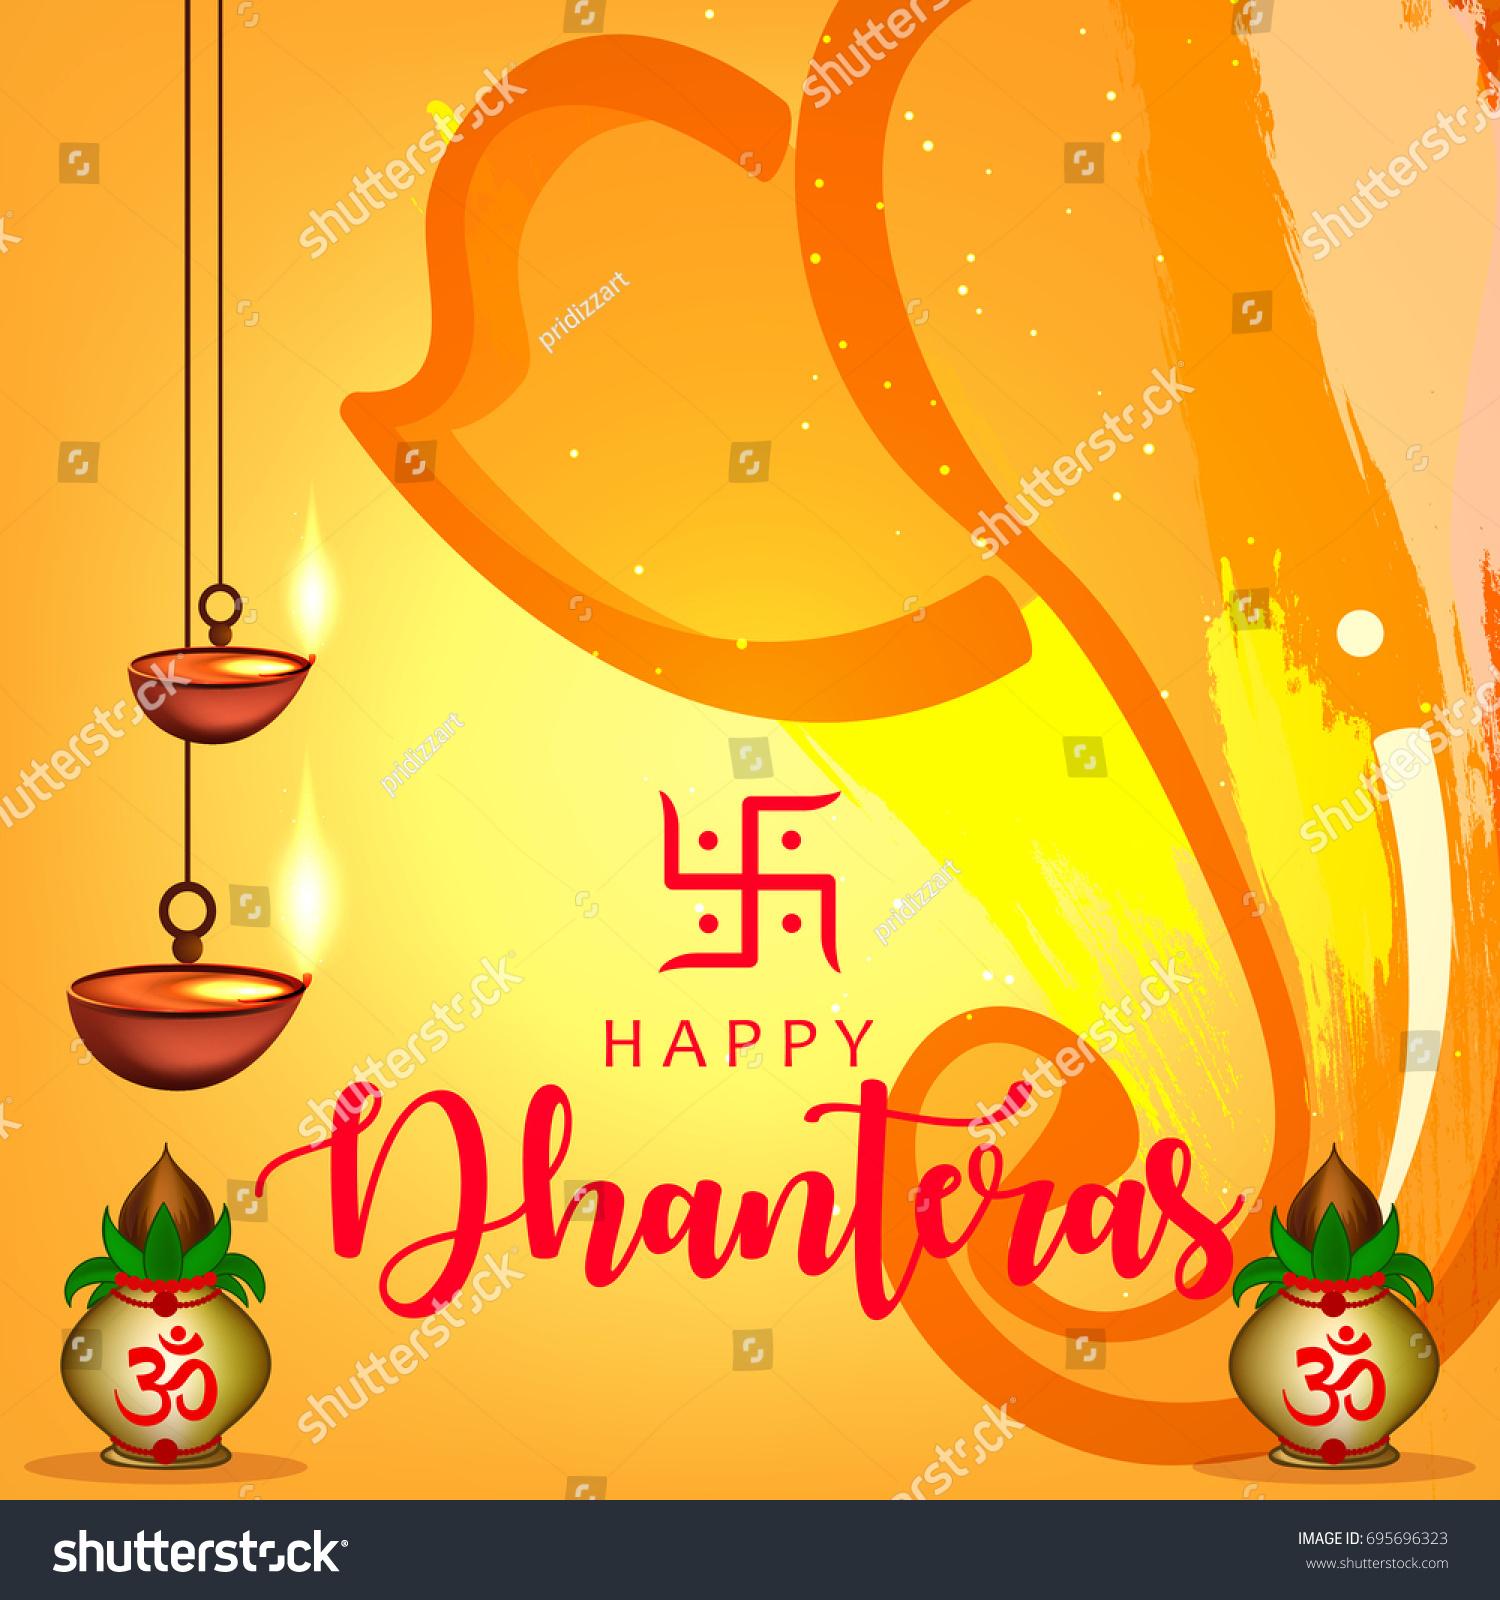 Happy Dhanteras Wallpaper Design Vector Illustration Stock Vector